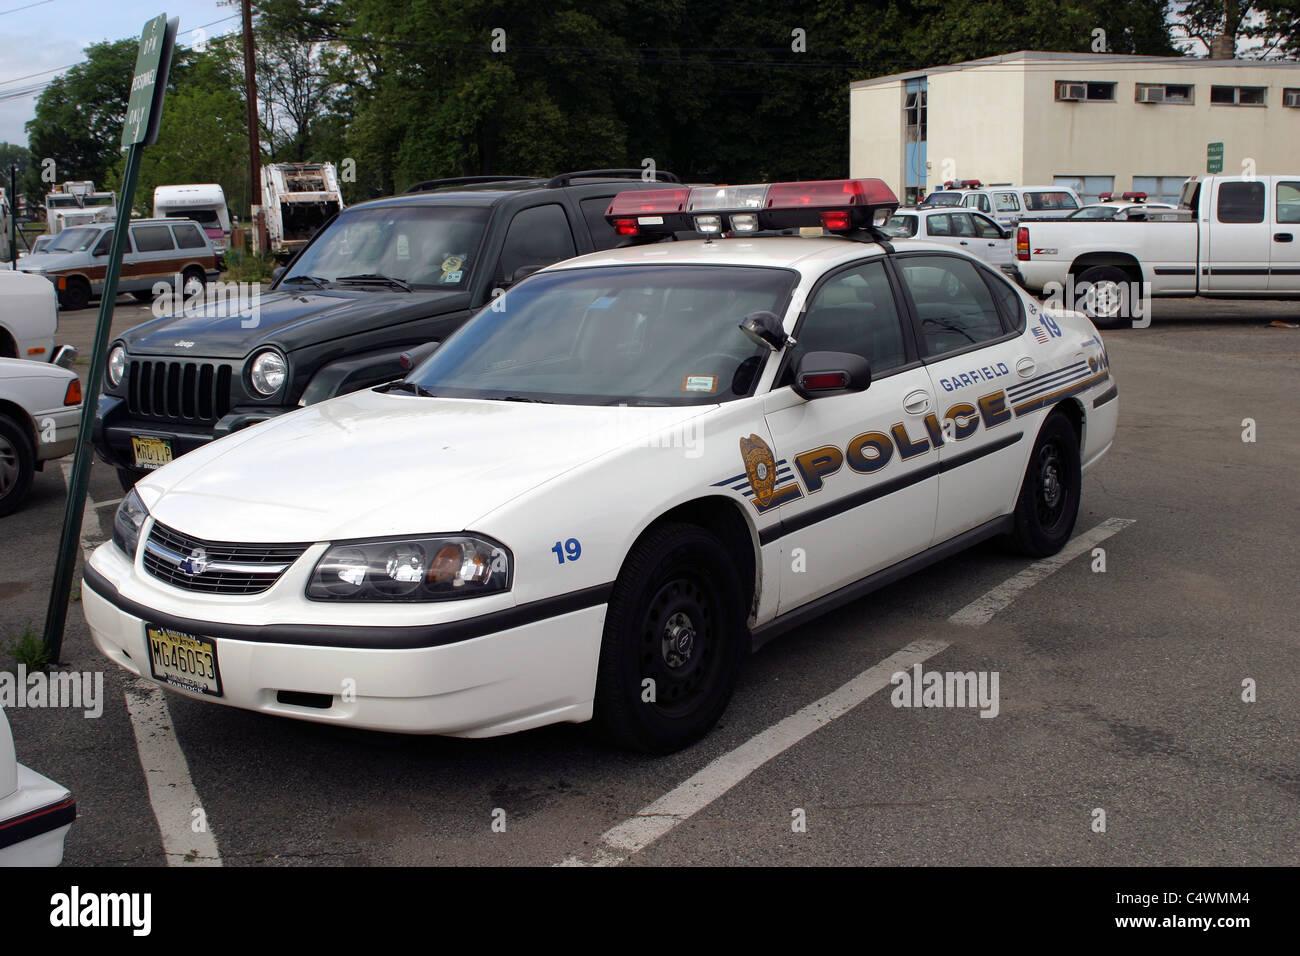 Police Radio Usa High Resolution Stock Photography And Images Alamy